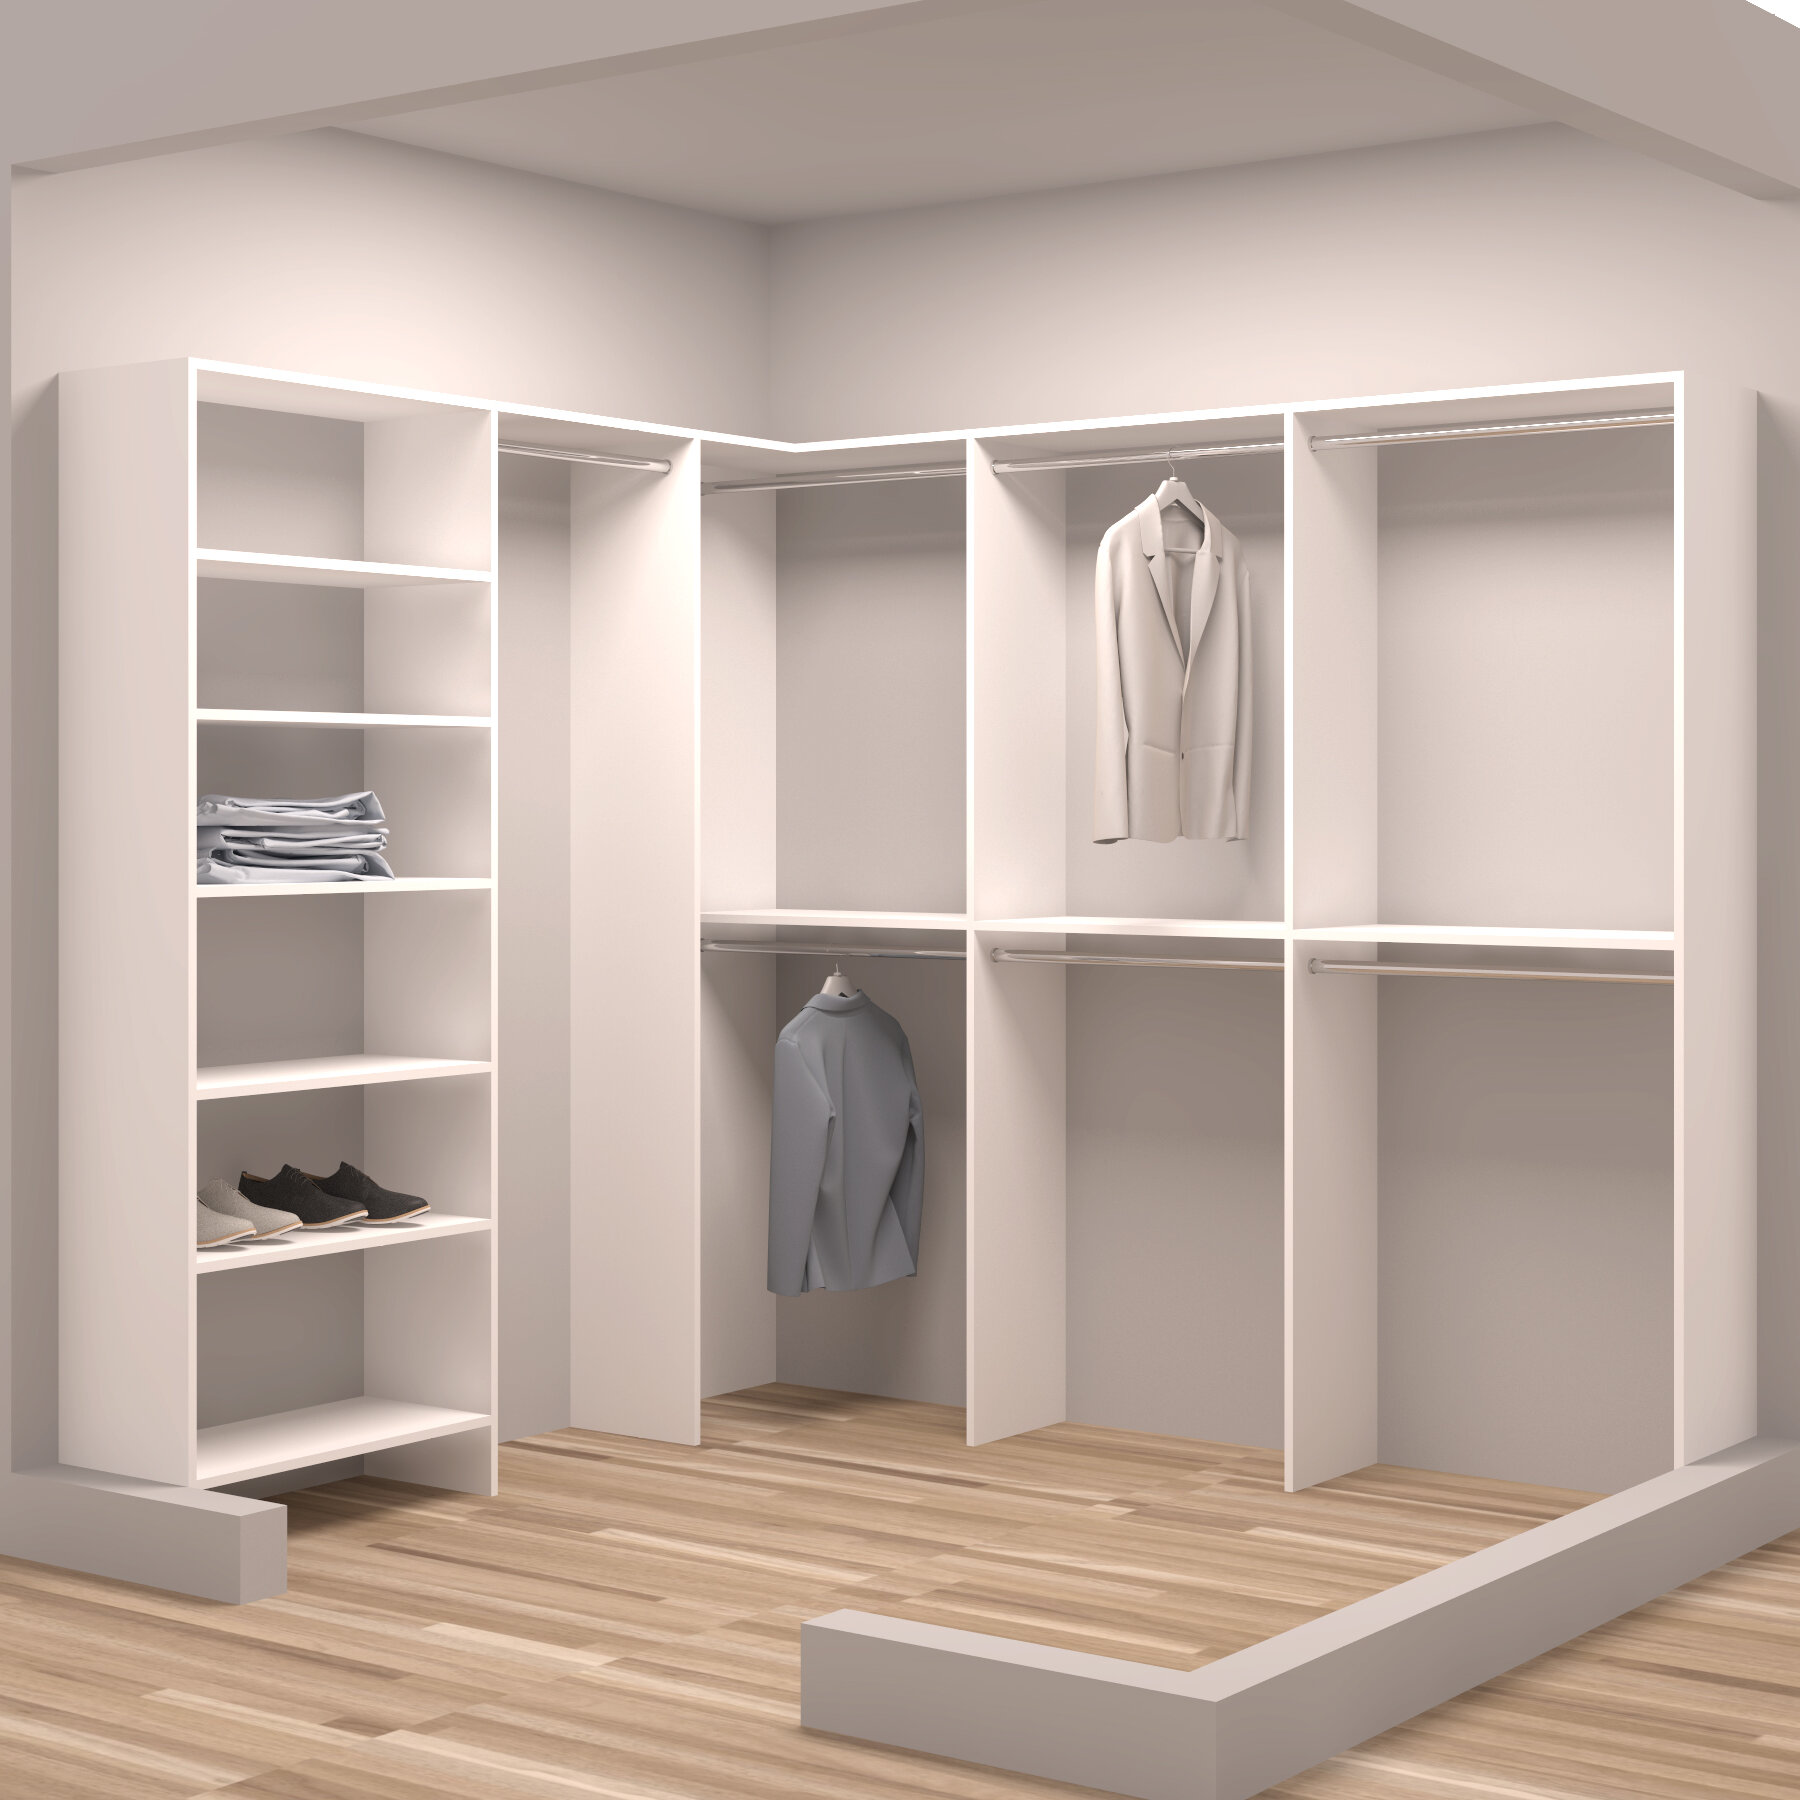 louis john ideas x l standard solid organizer closet wood system home